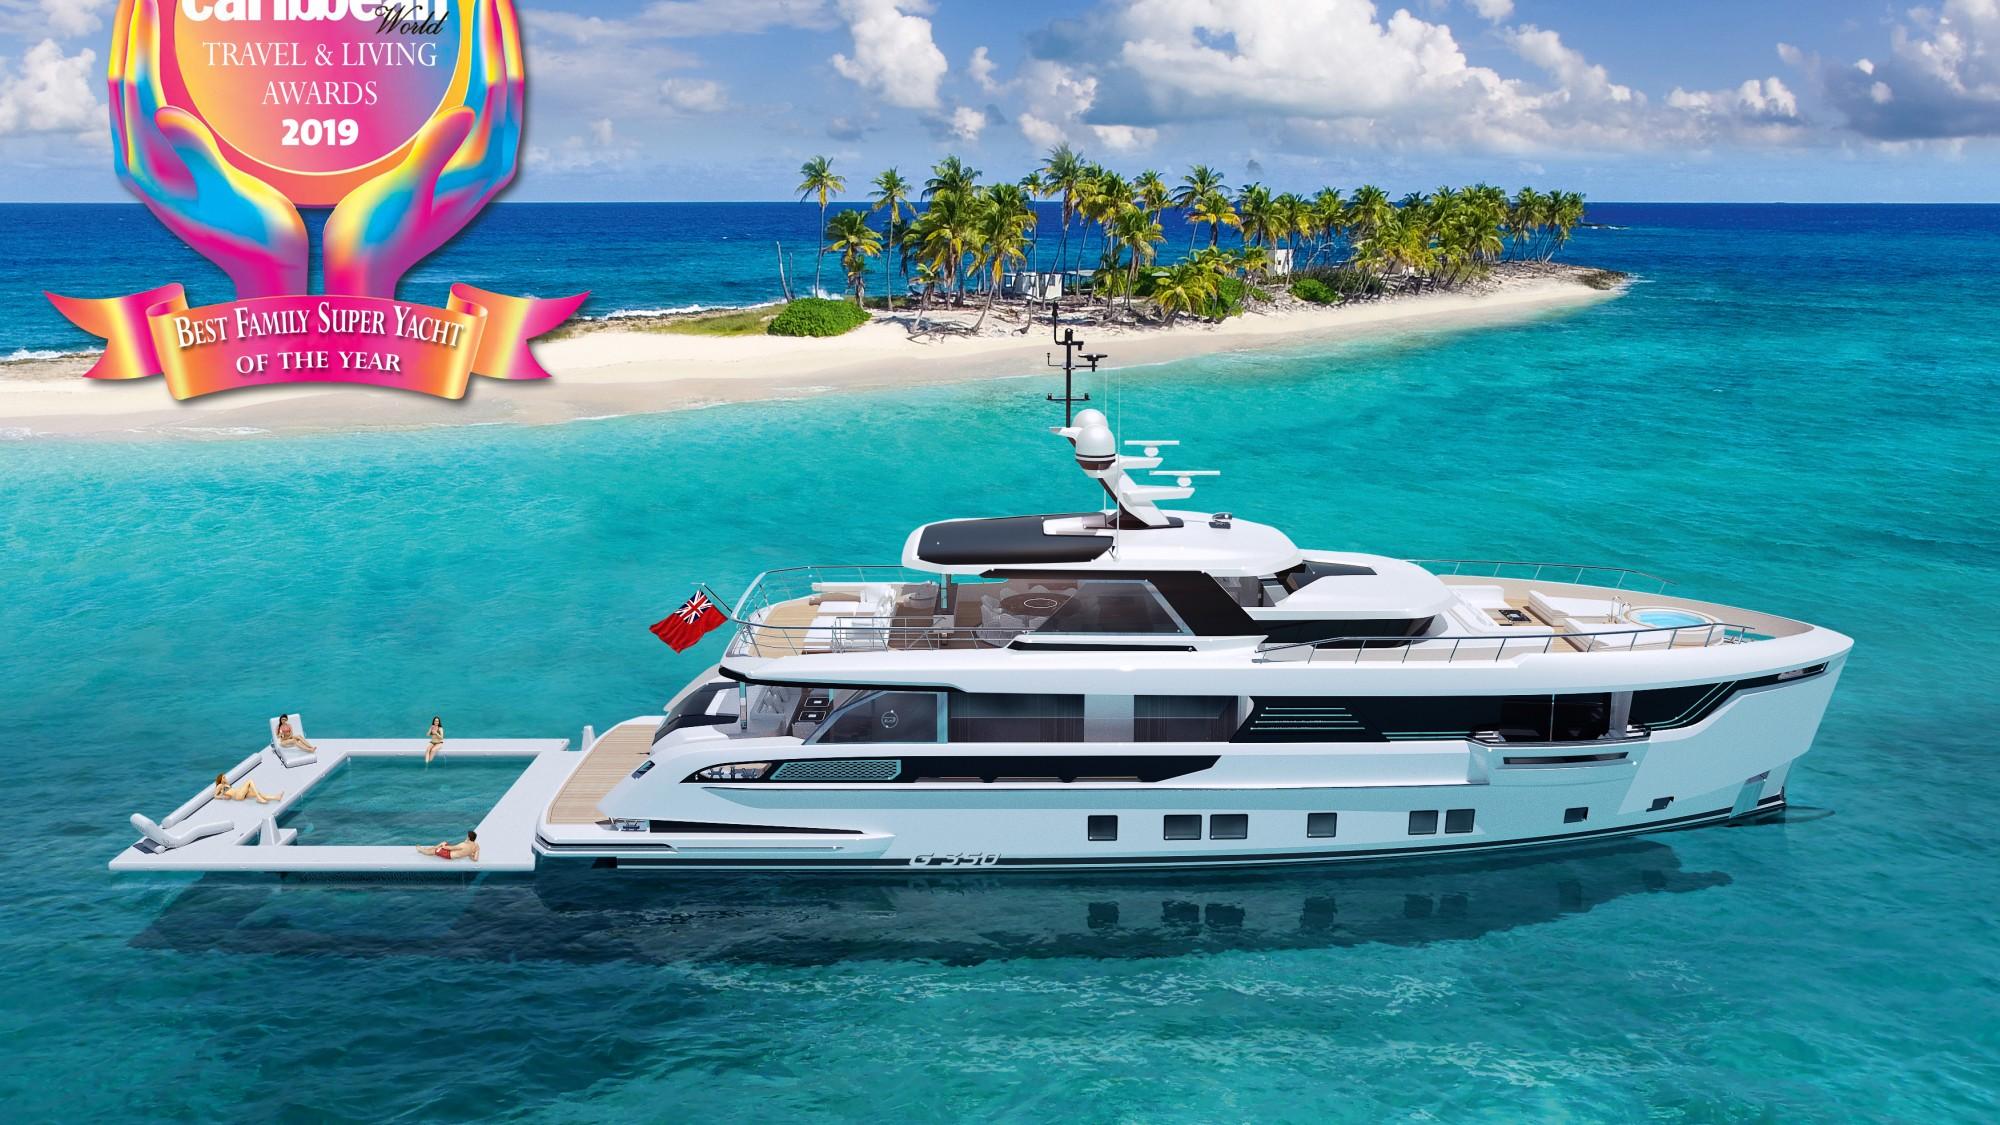 Dynamiq wins Best Family Superyacht award from Caribbean World Magazine!